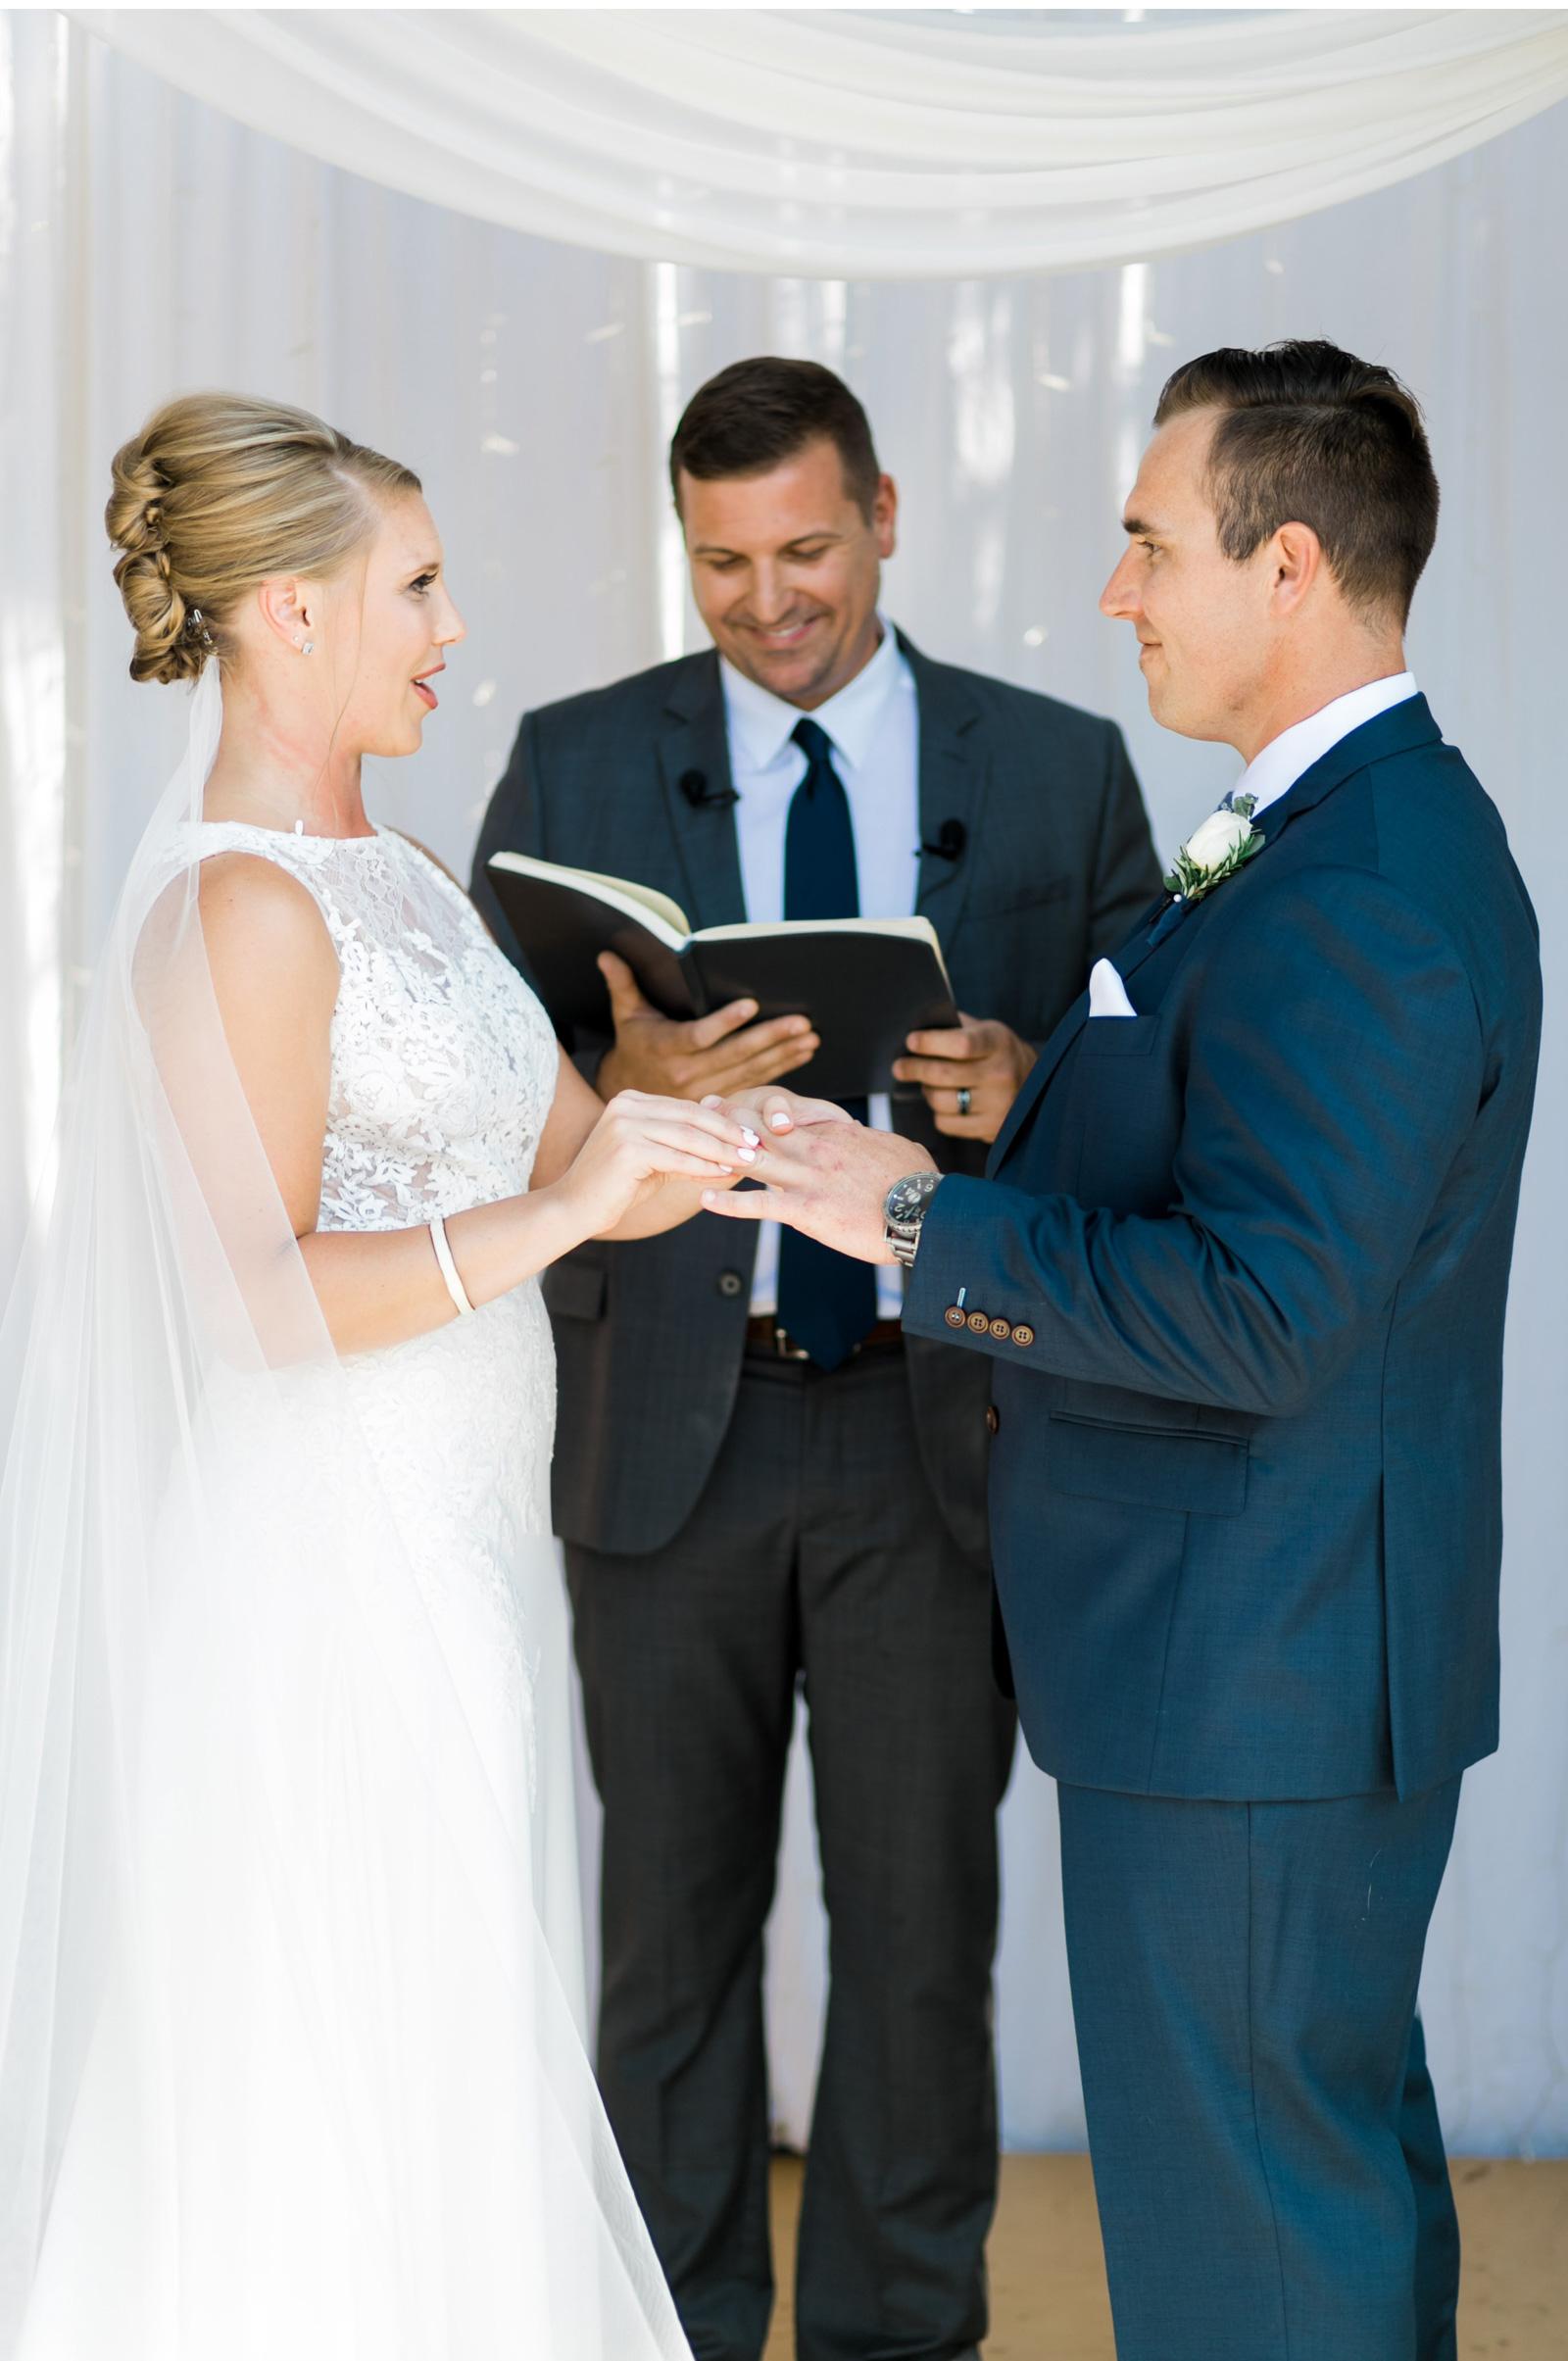 San-Luis-Obispo-Wedding-Photographer-Natalie-Schutt-Photography-Style-Me-Pretty_12.jpg